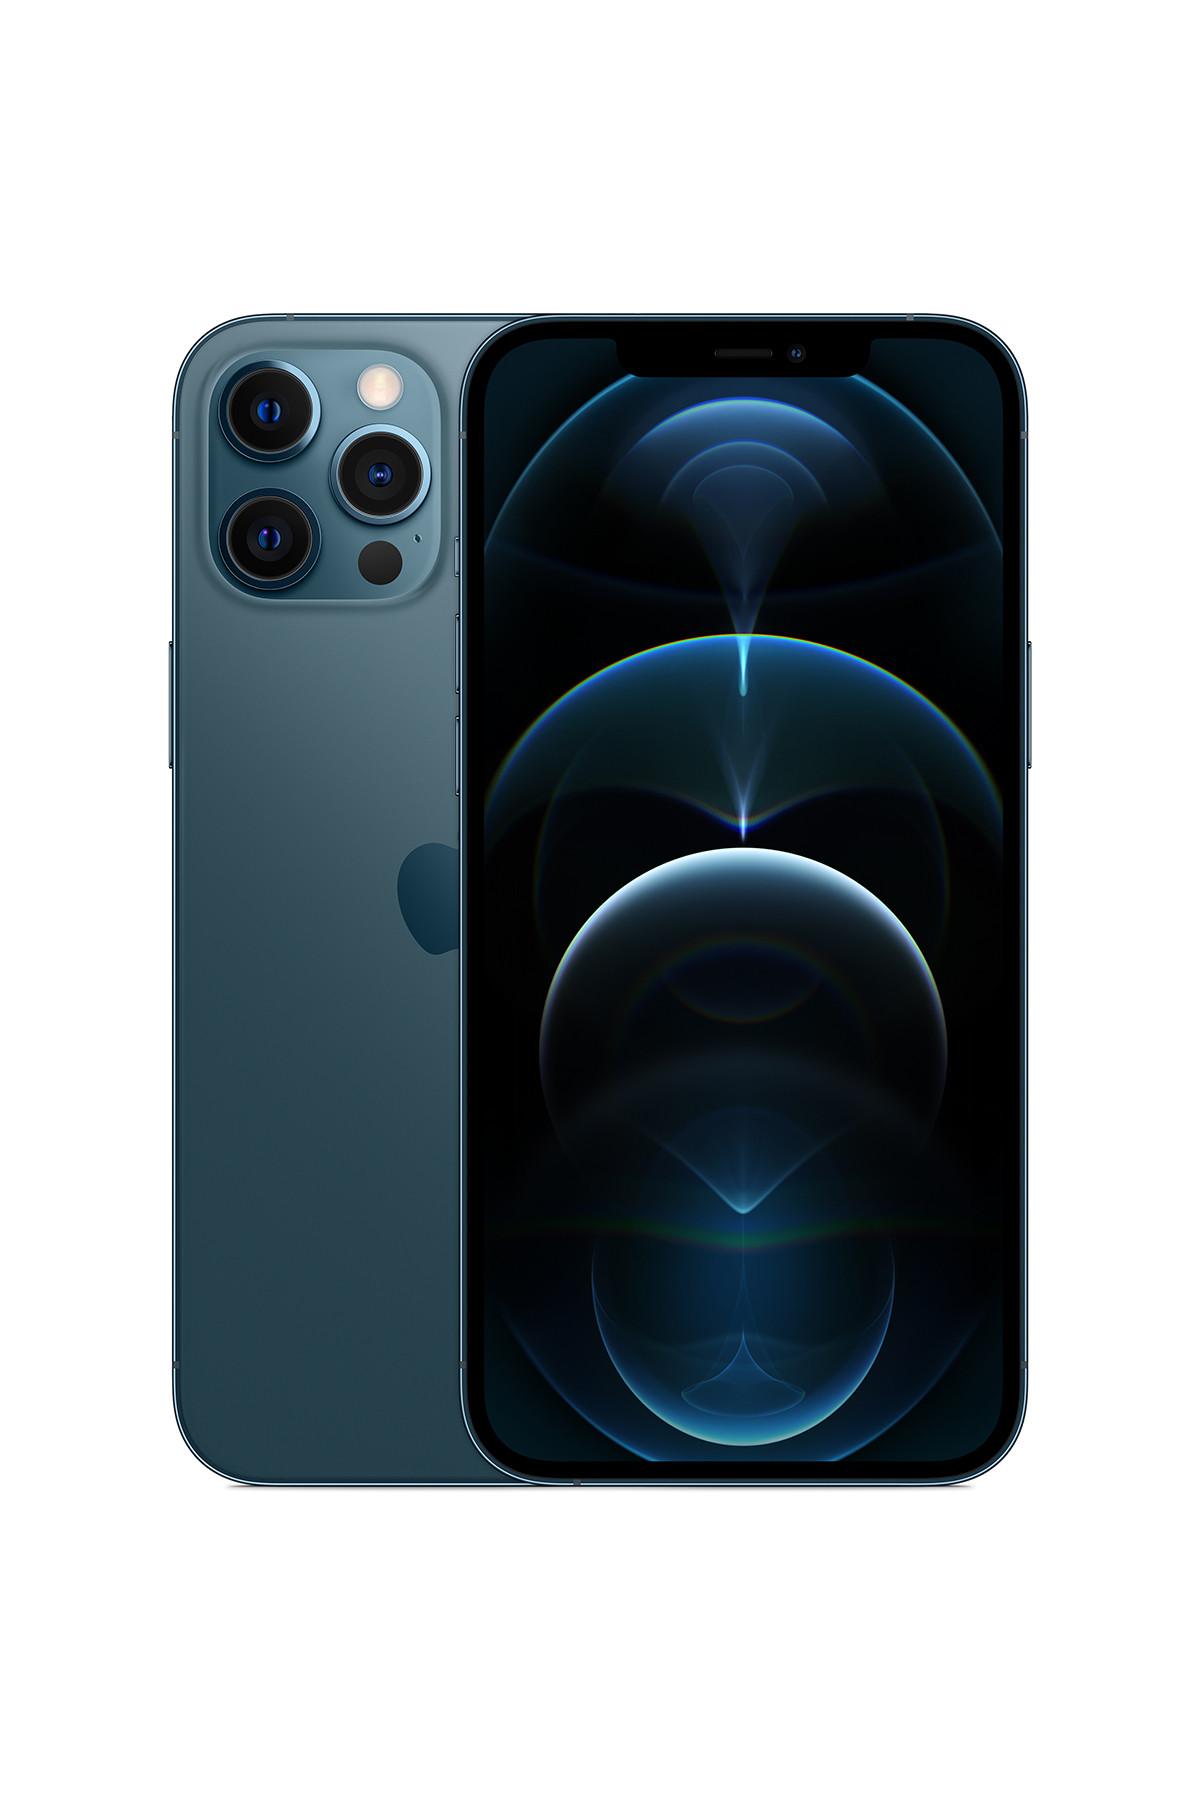 iPhone 12 Pro Max 128GB - Pacific Blue